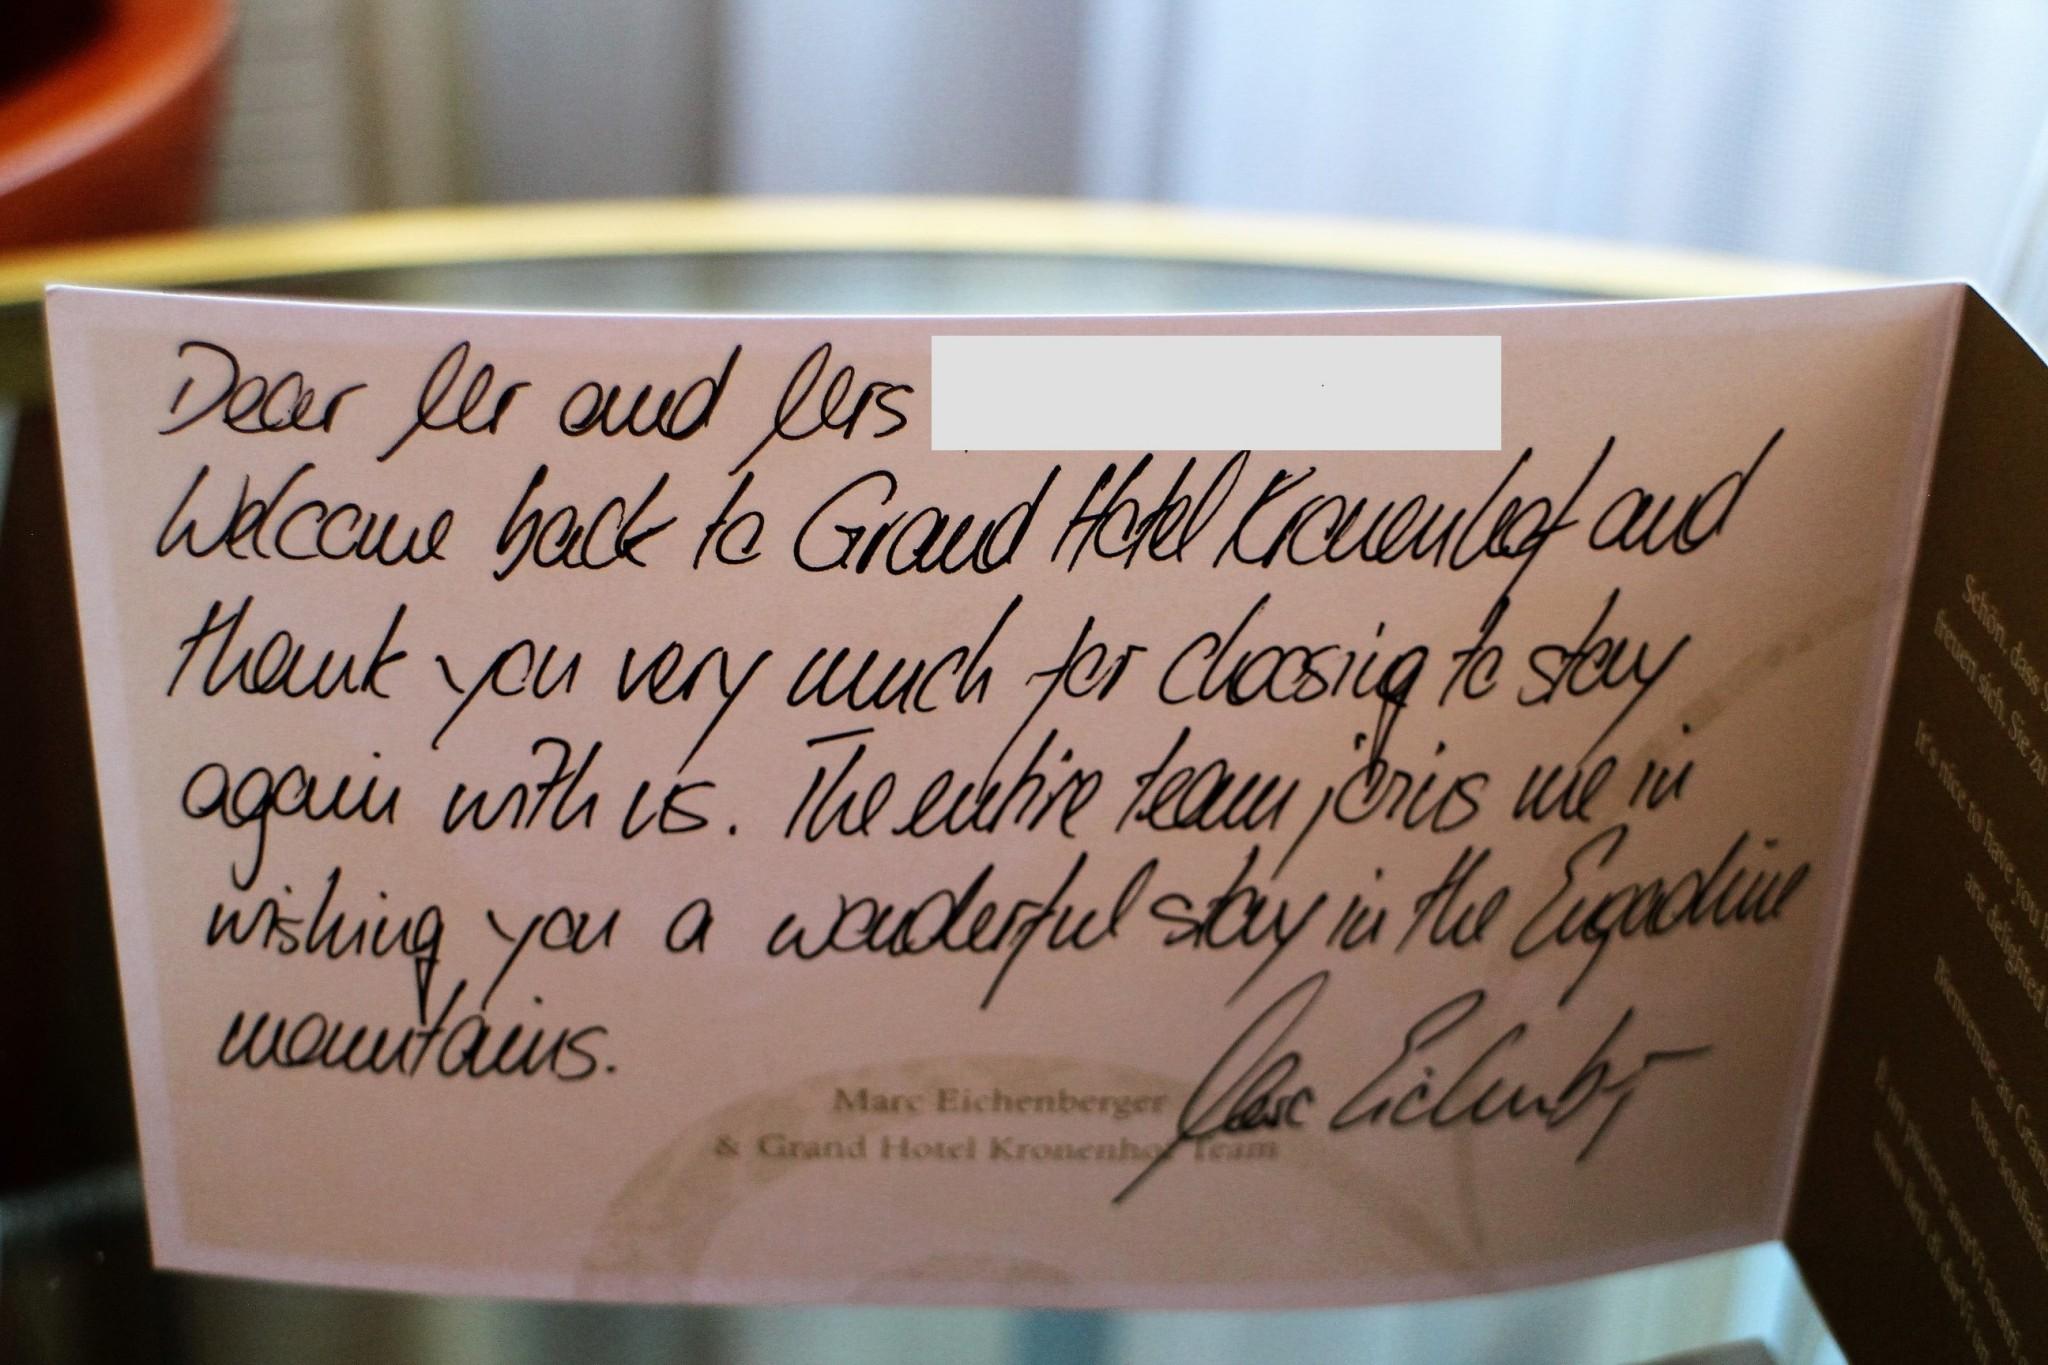 Grand Hotel Kronenhof personal message